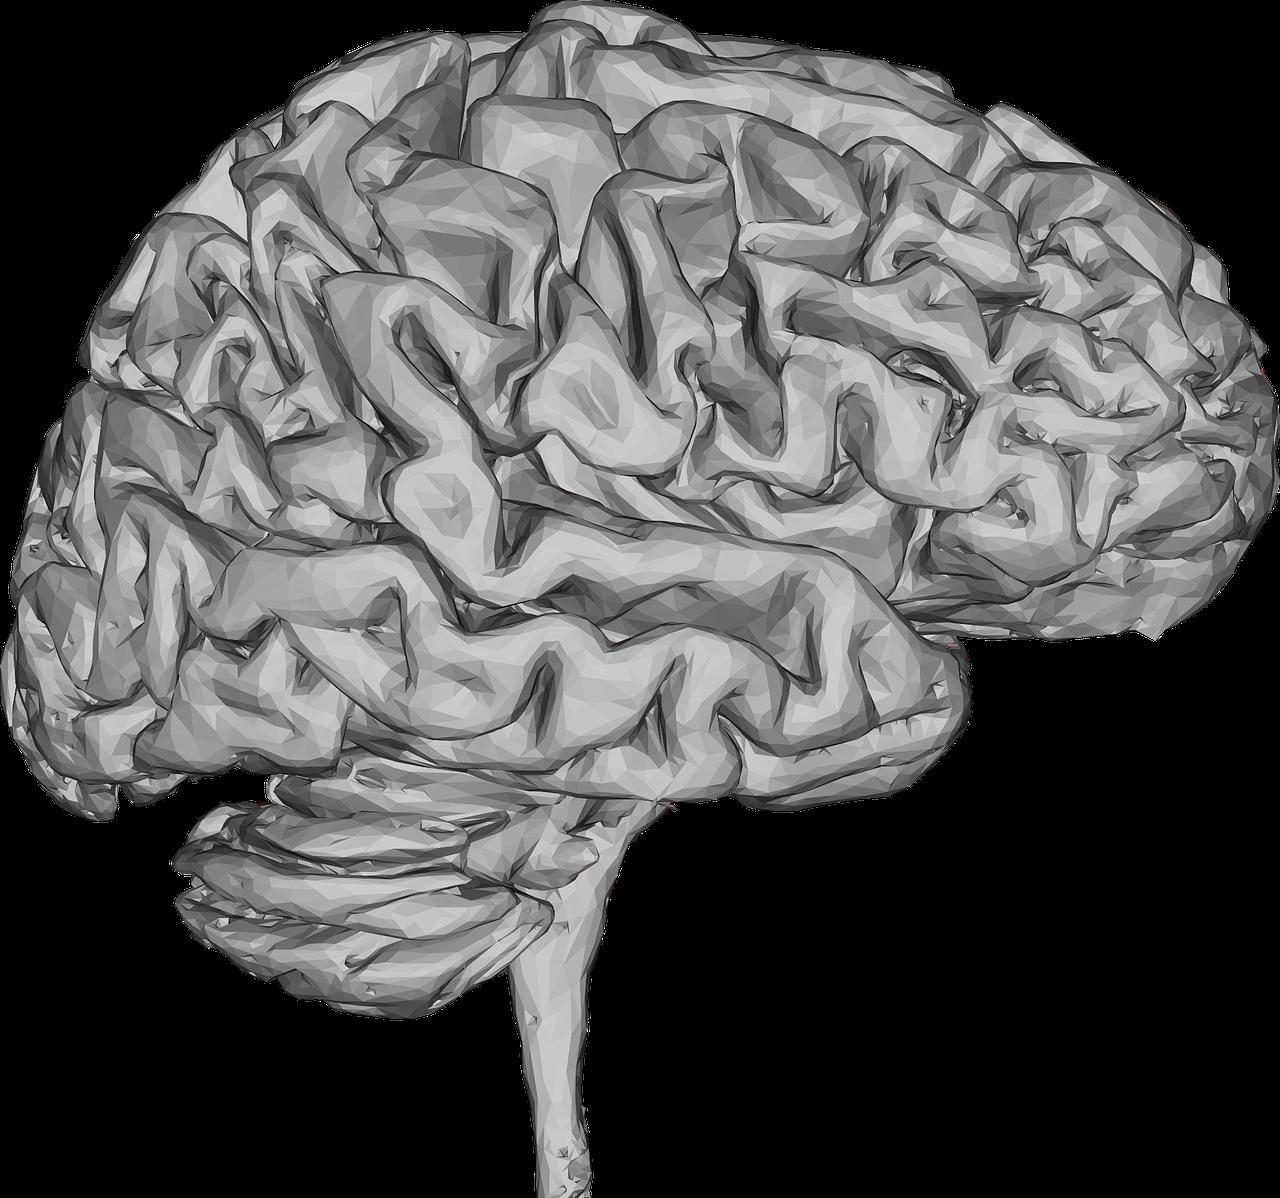 Второй мозг картинки